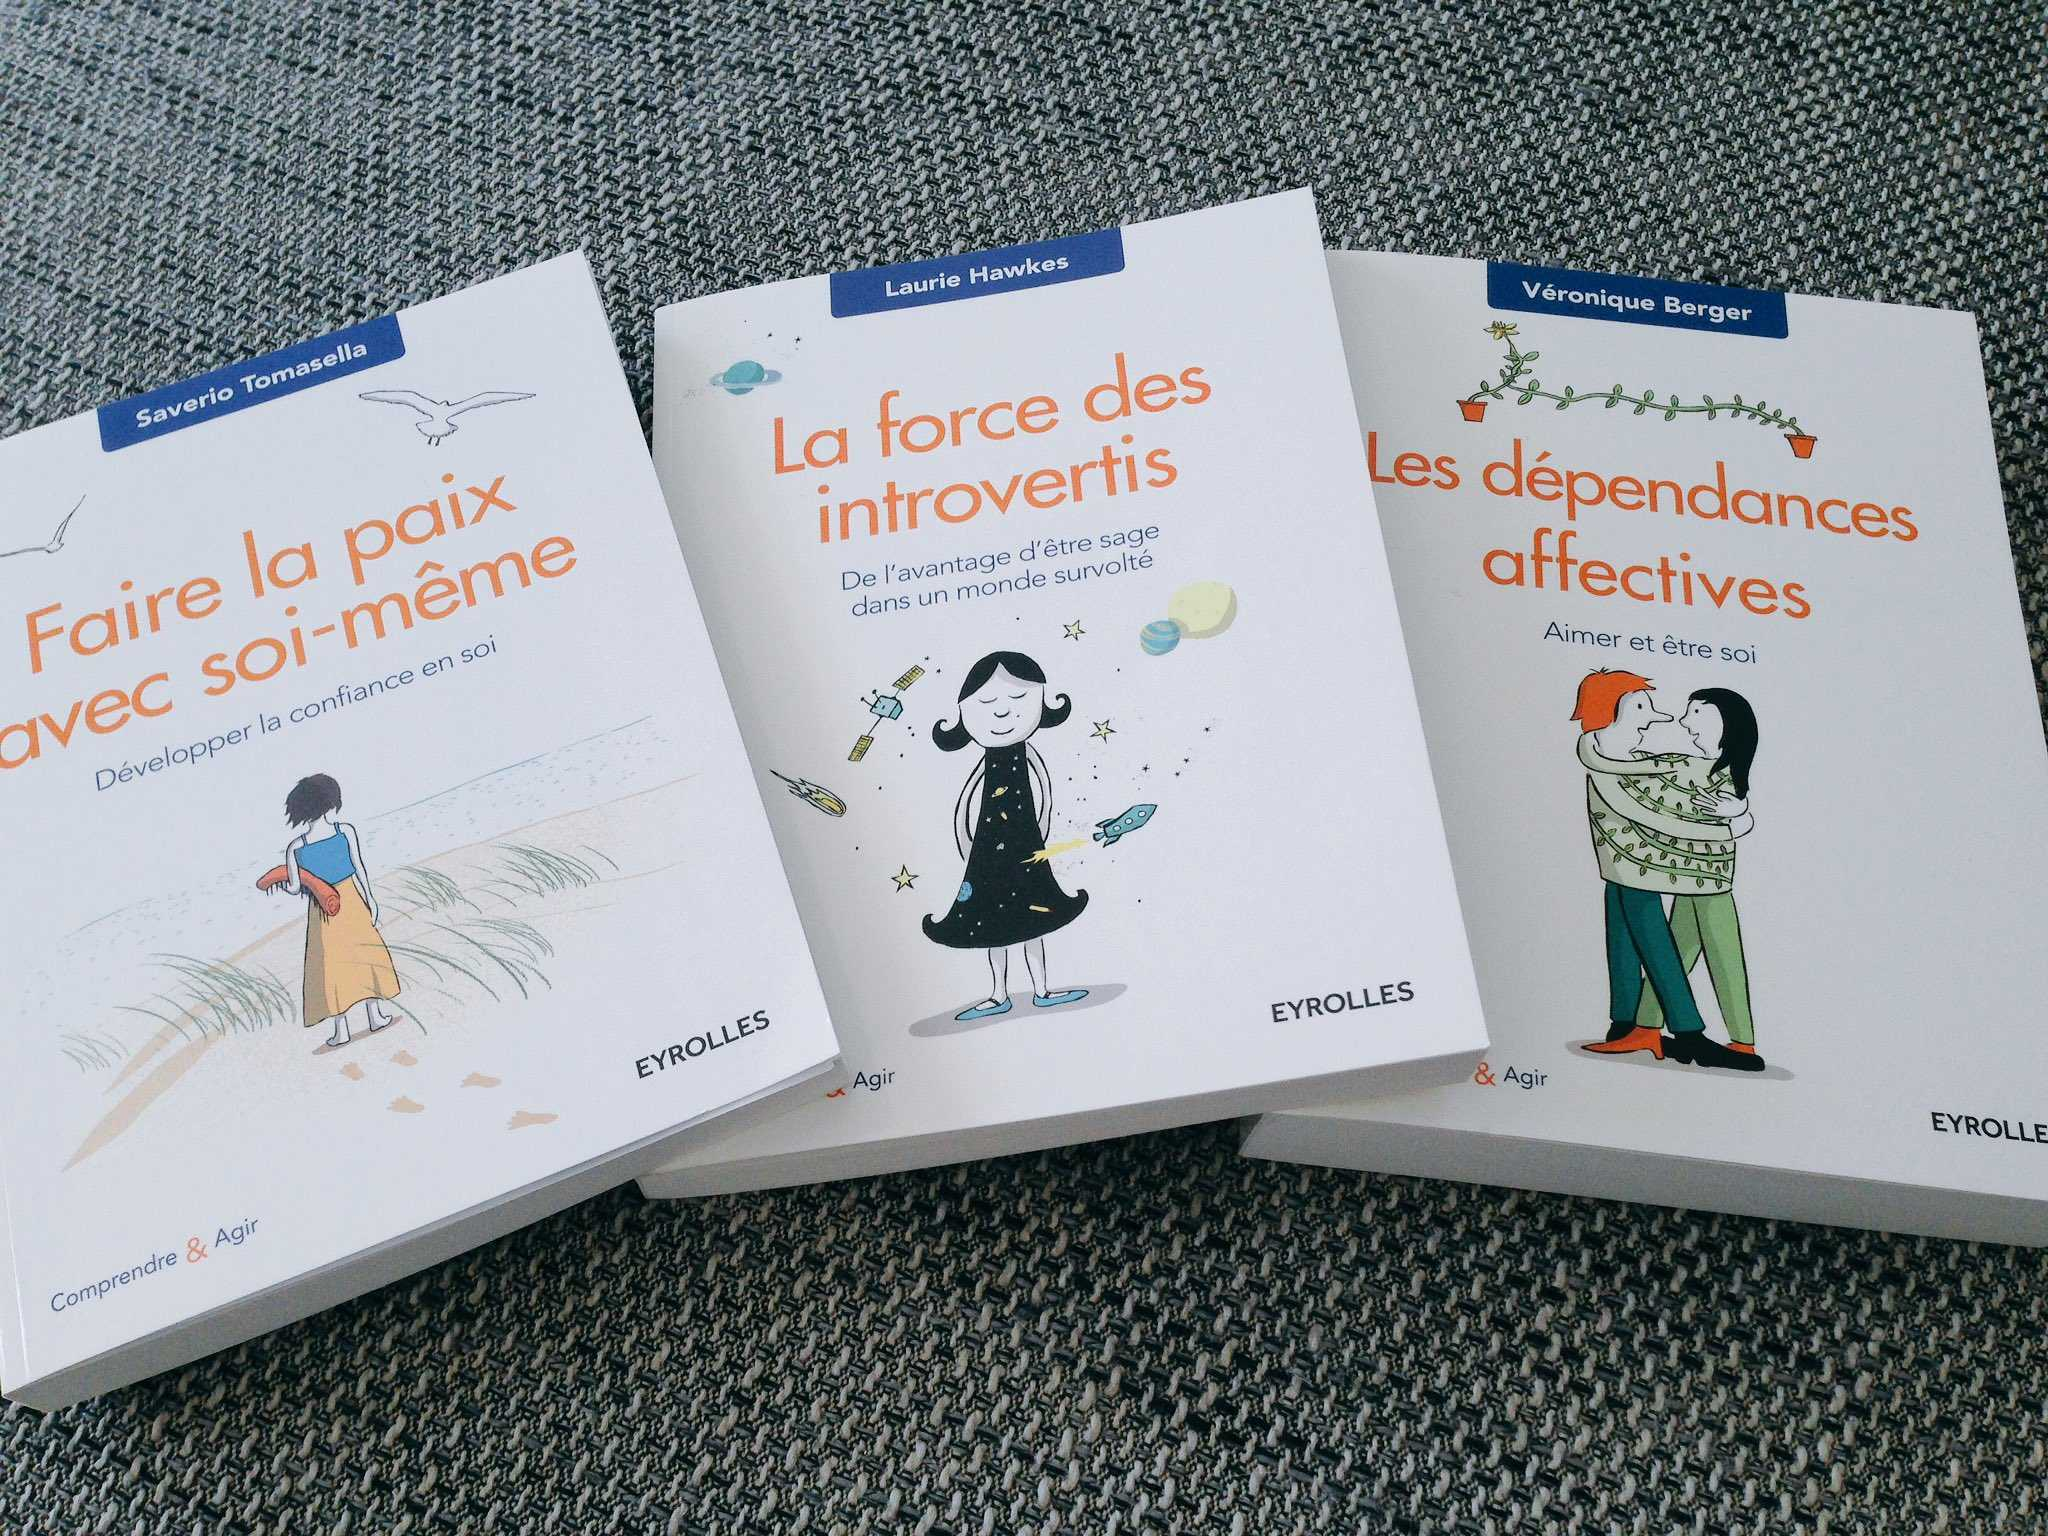 Collection Comprendre et Agir - Eyrolles : Livres de psychologie